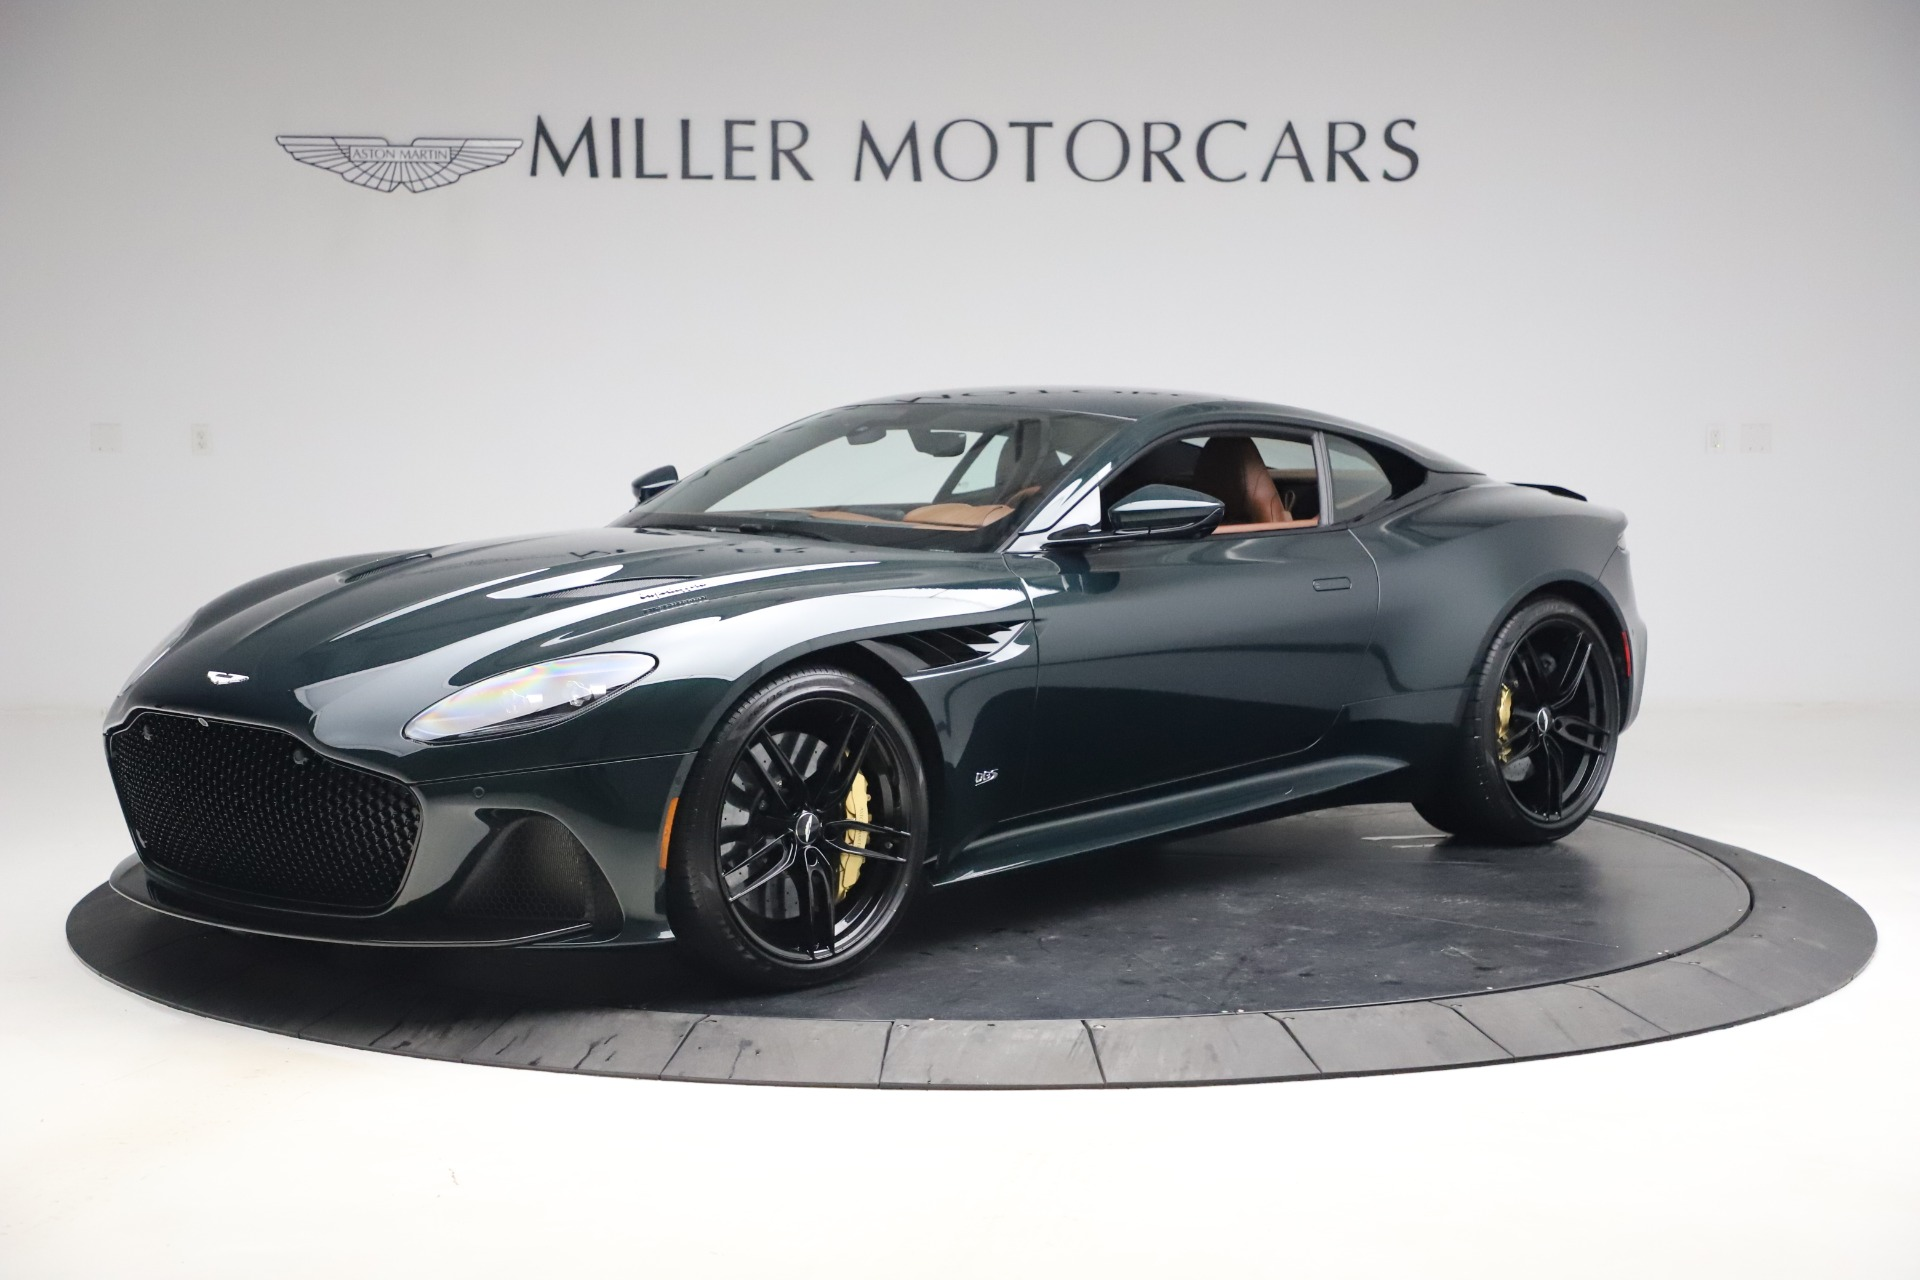 Used 2020 Aston Martin DBS Superleggera for sale $295,900 at Pagani of Greenwich in Greenwich CT 06830 1